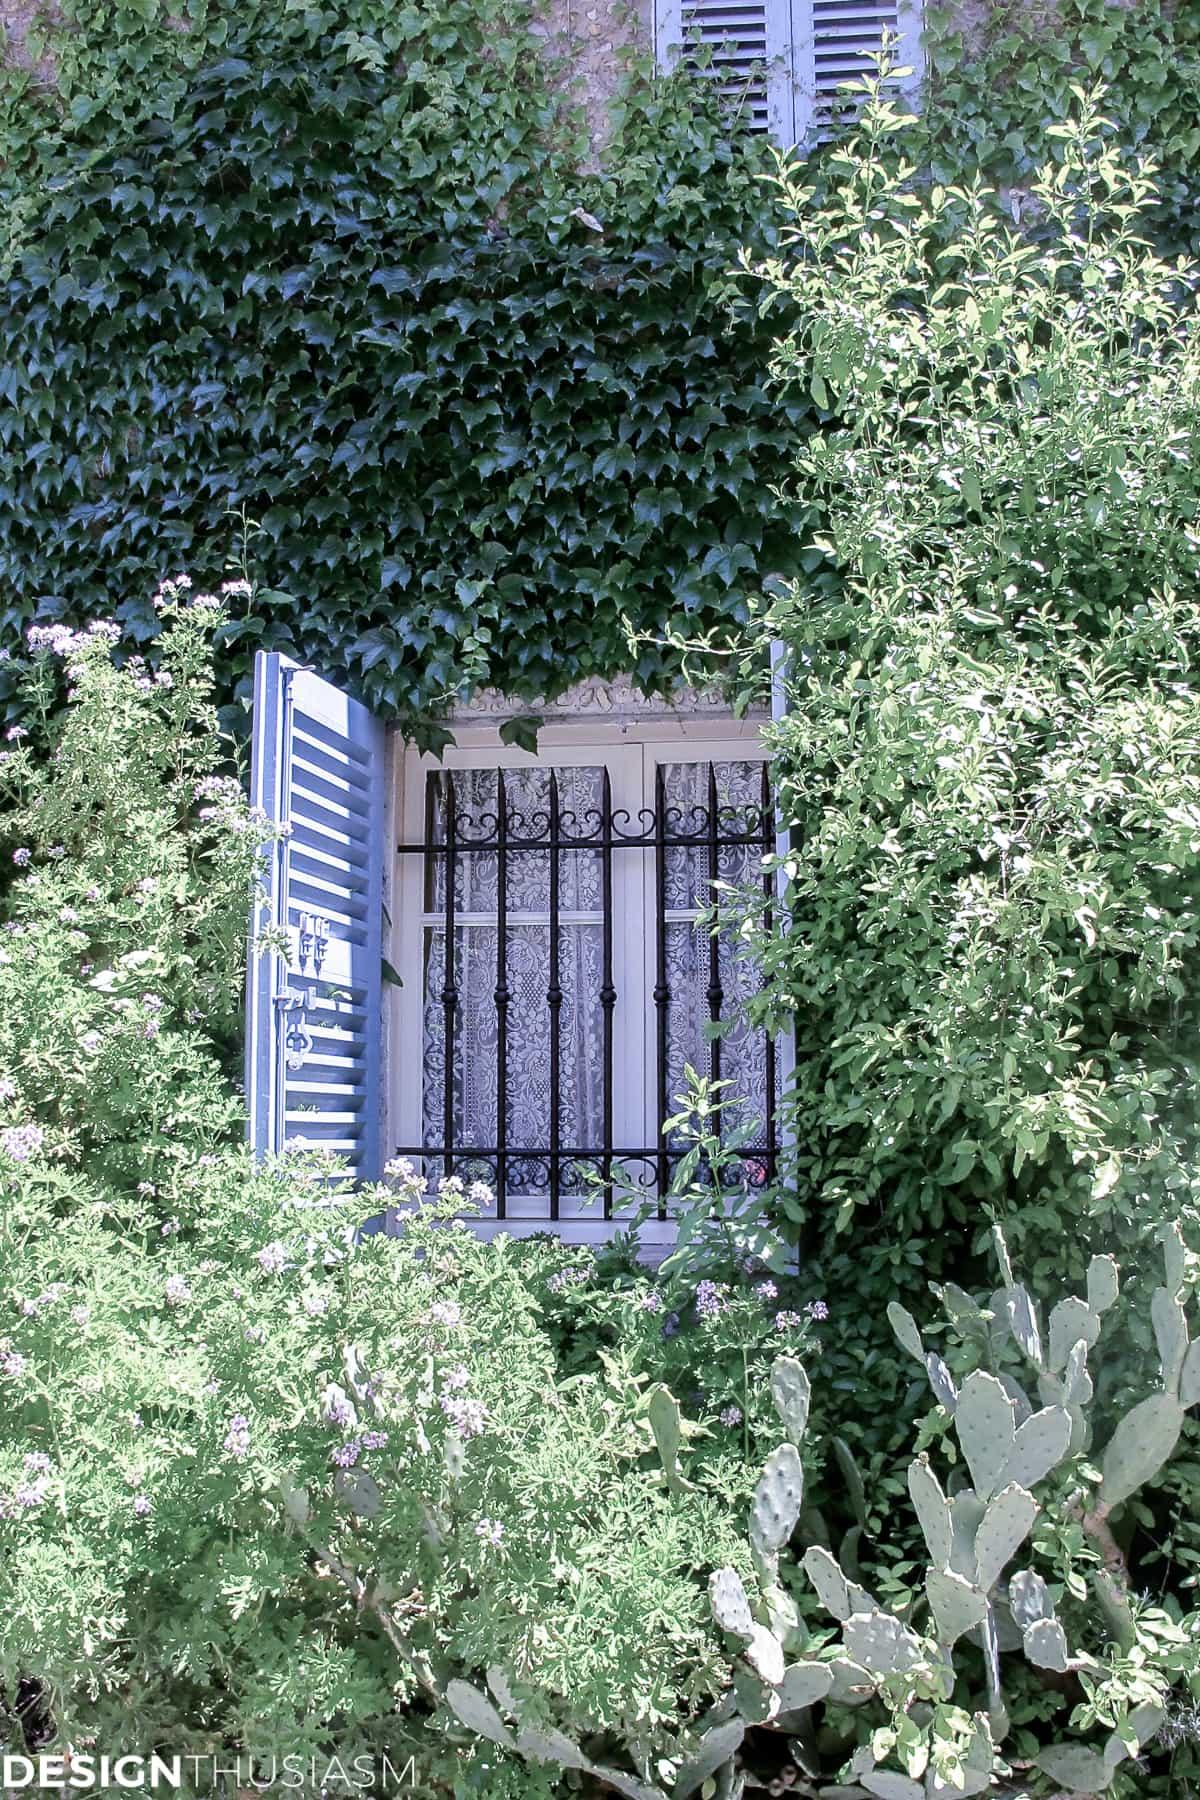 Designthusiasm - Home Style Saturday